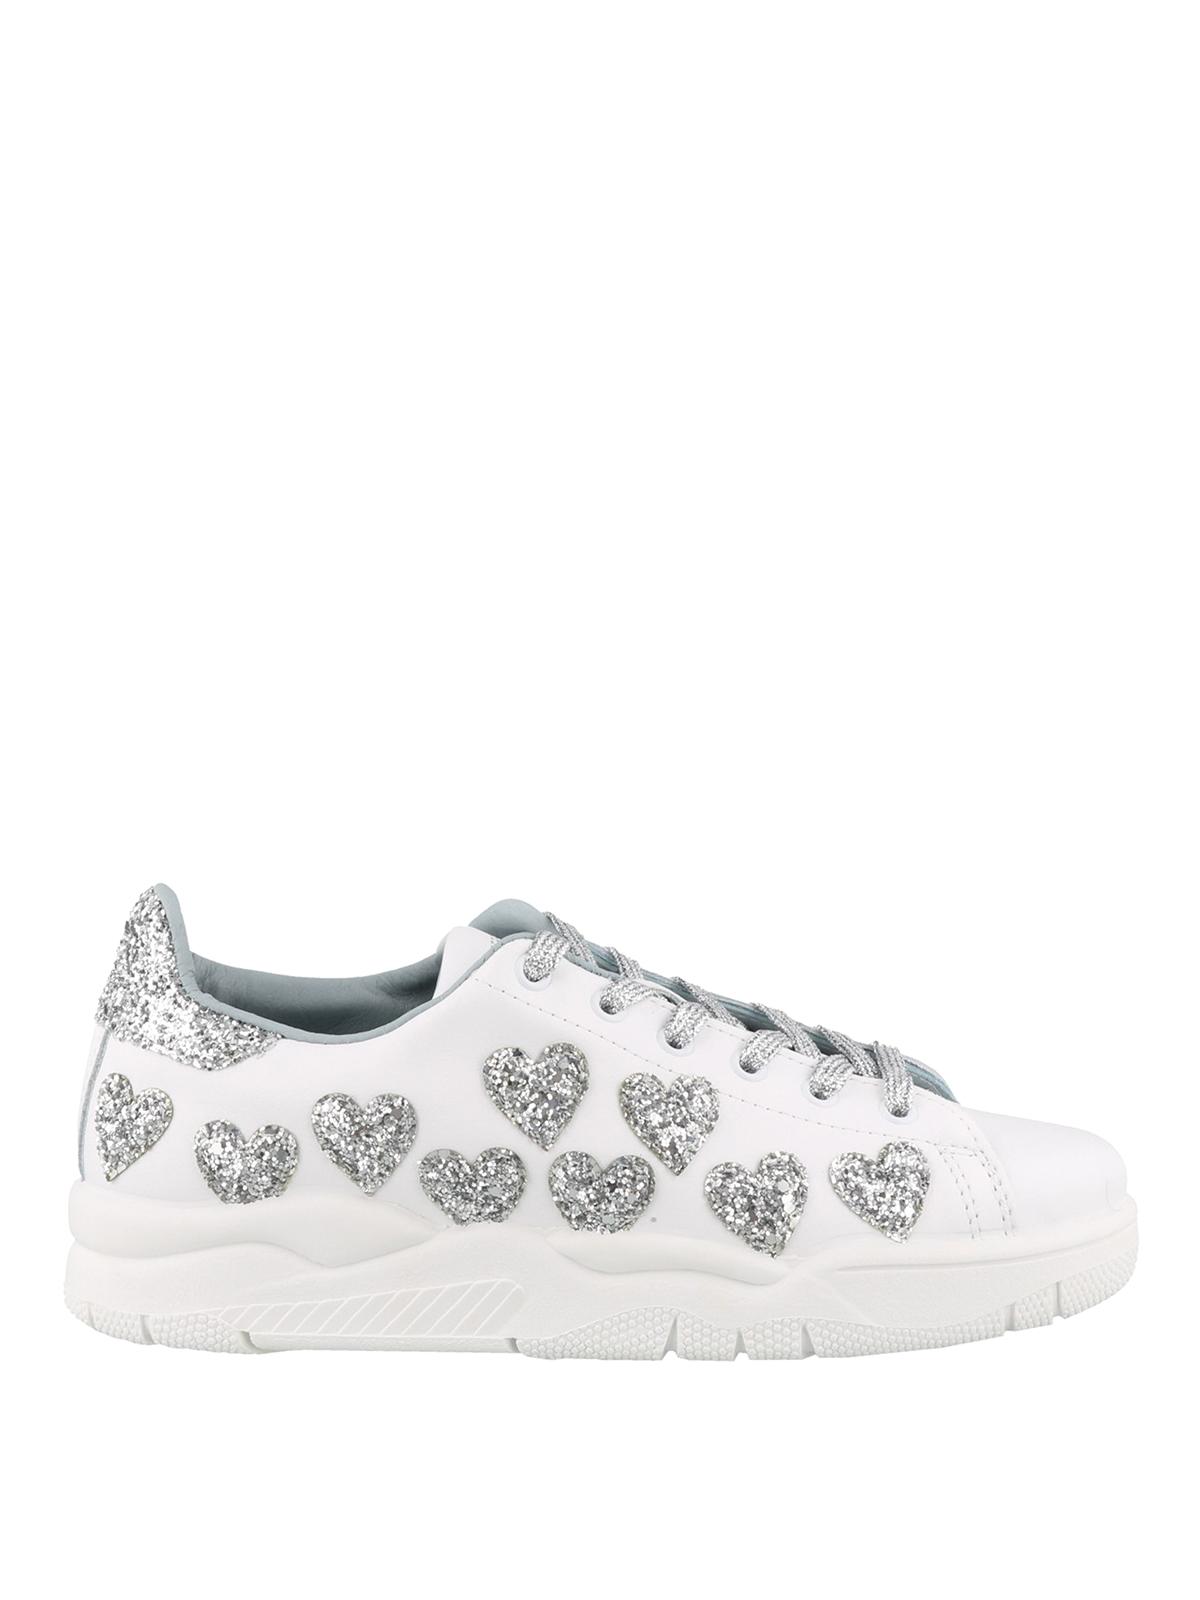 5c6924ab92c Chiara Ferragni - Hearts white leather sneakers - trainers - CF2252